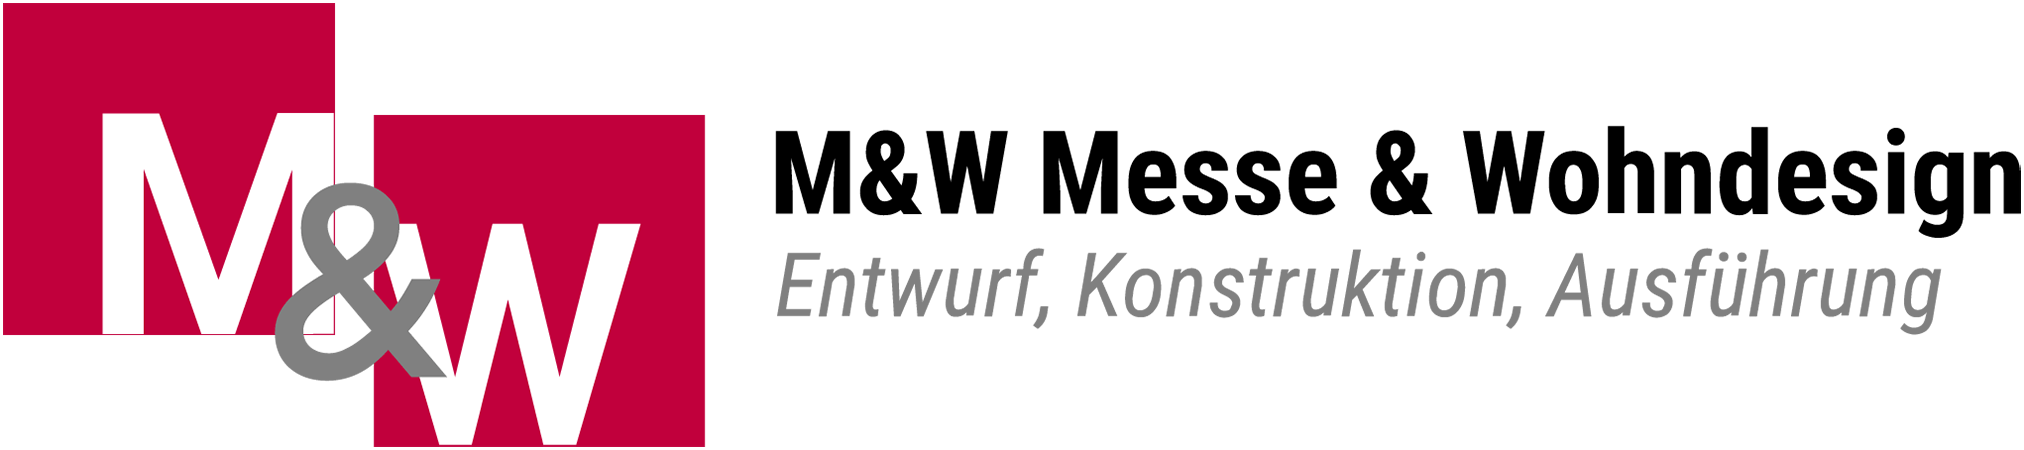 M&W Messe & Wohndesign GmbH